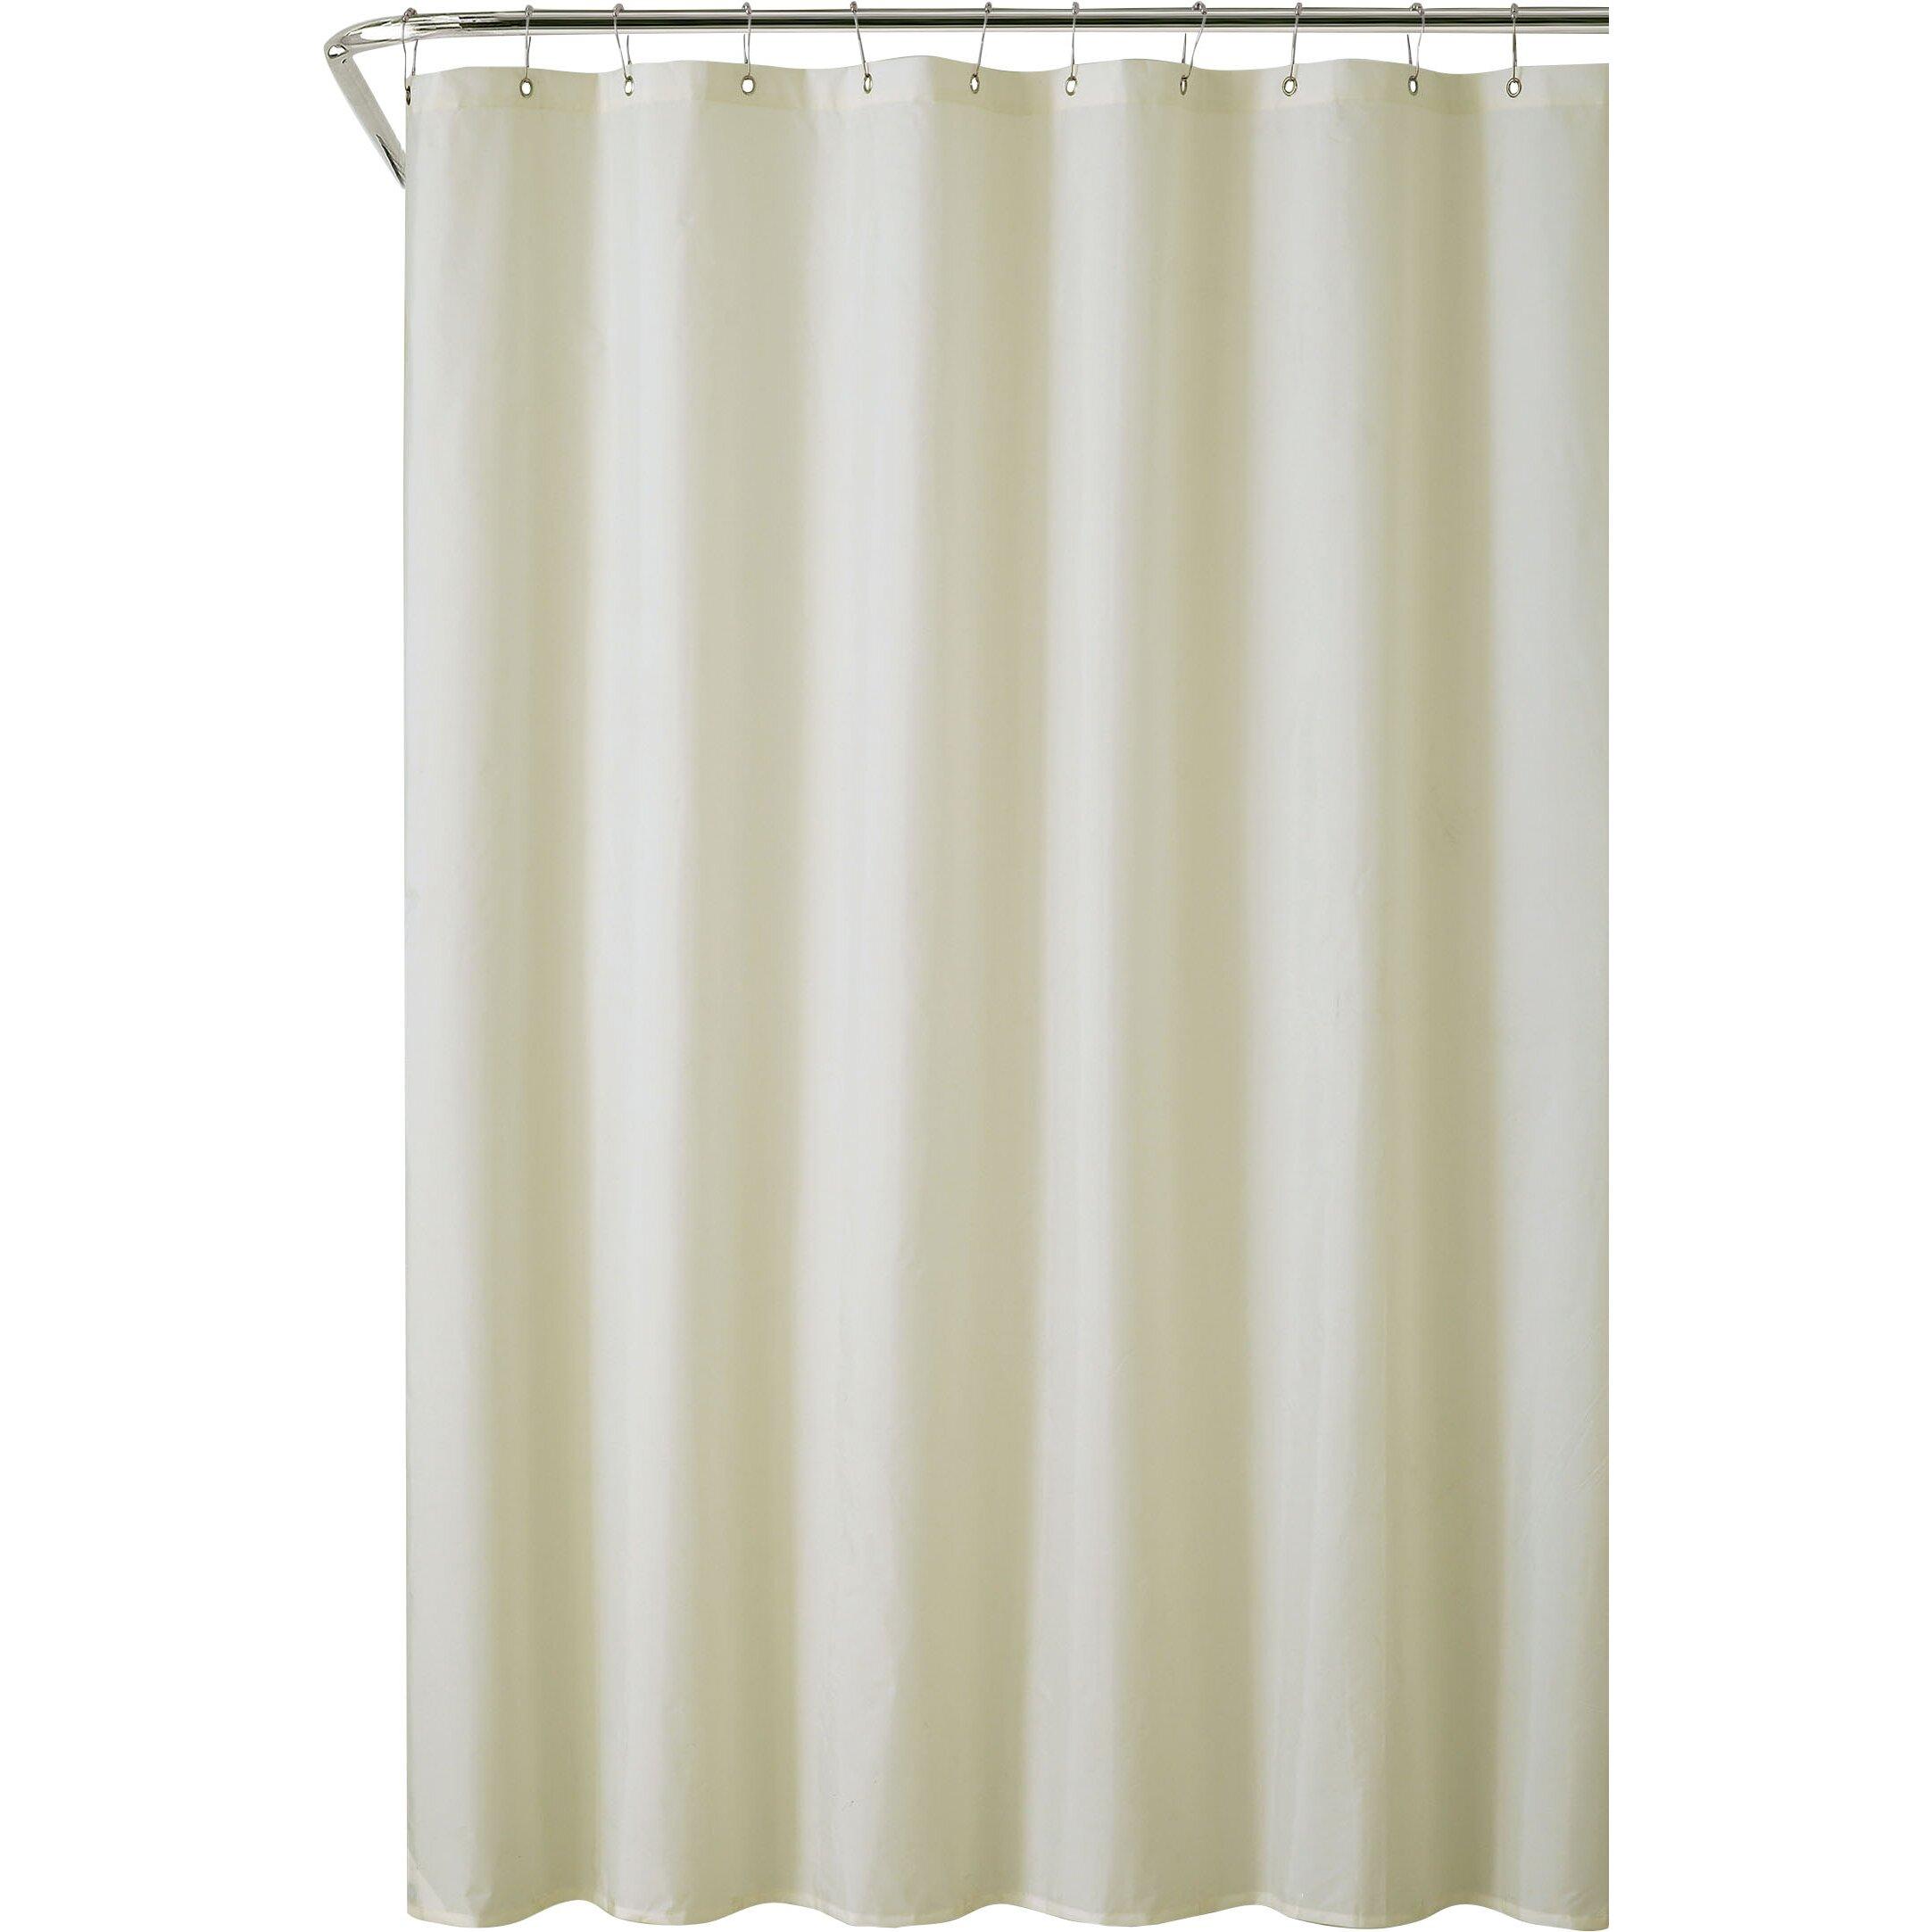 Symple Stuff Vinyl Water Proof Shower Curtain Liner Reviews Wayfair